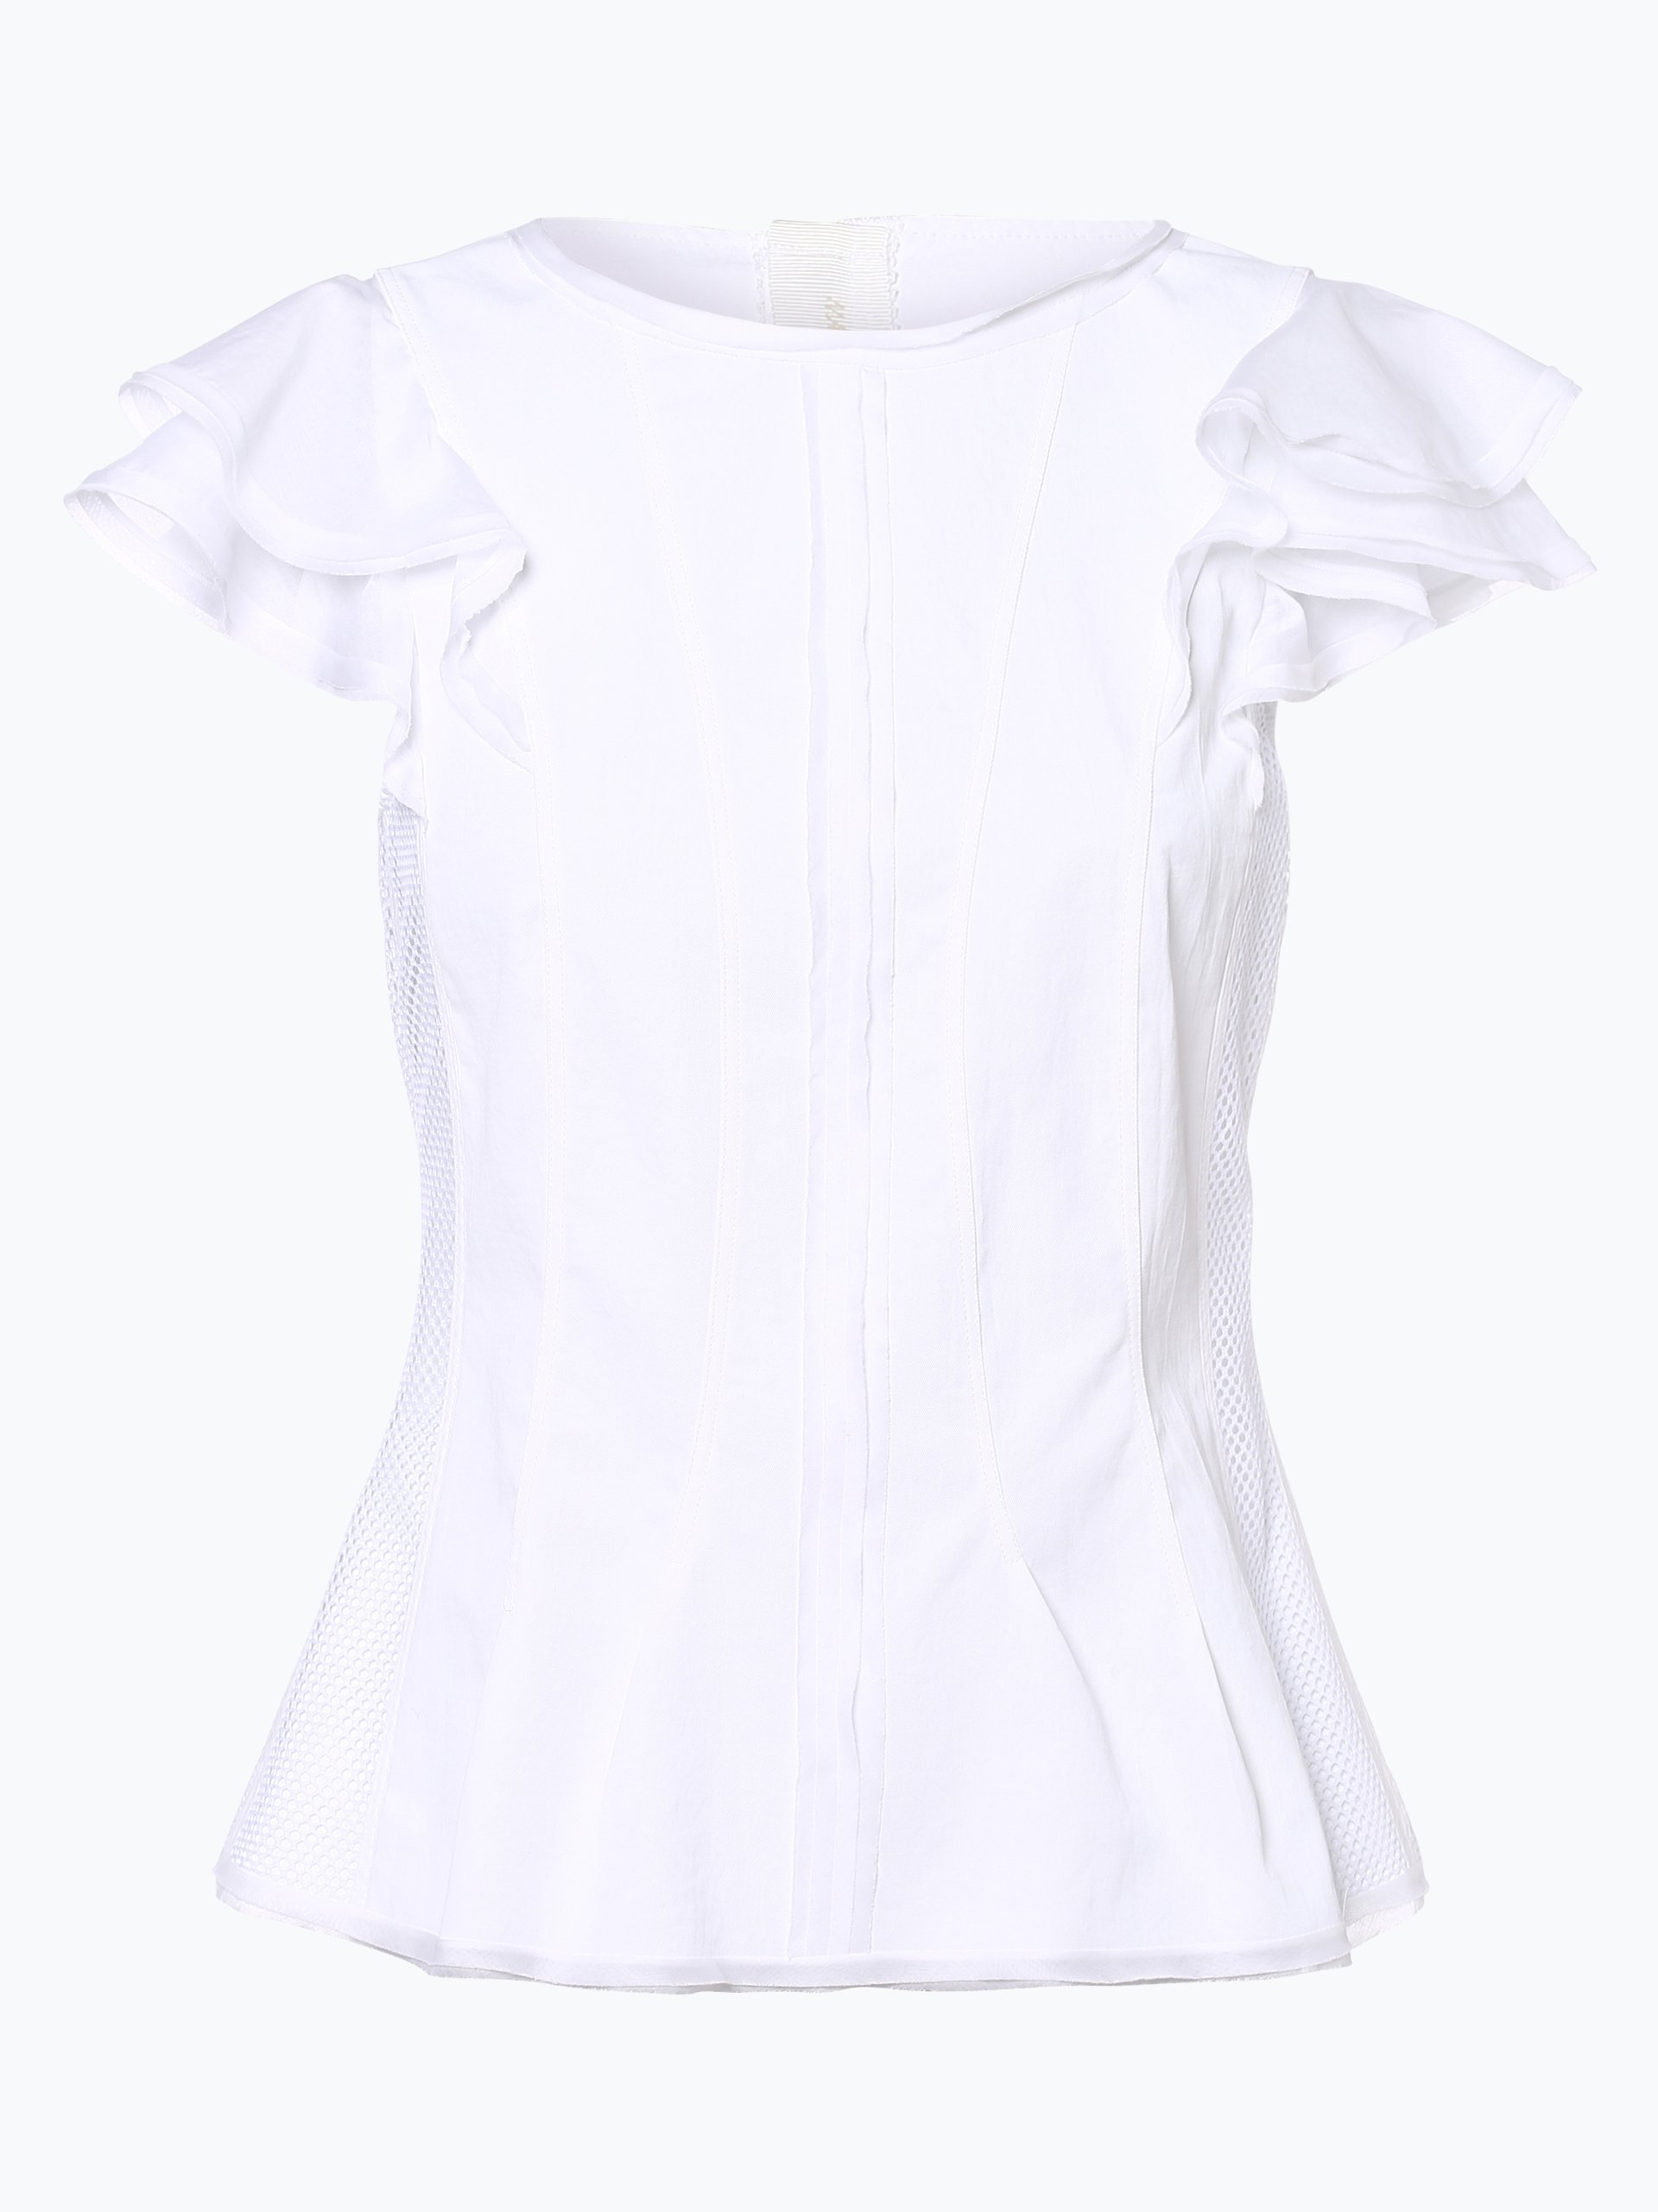 Marc Cain Collections Damen Blusenshirt mit Leinen-Anteil